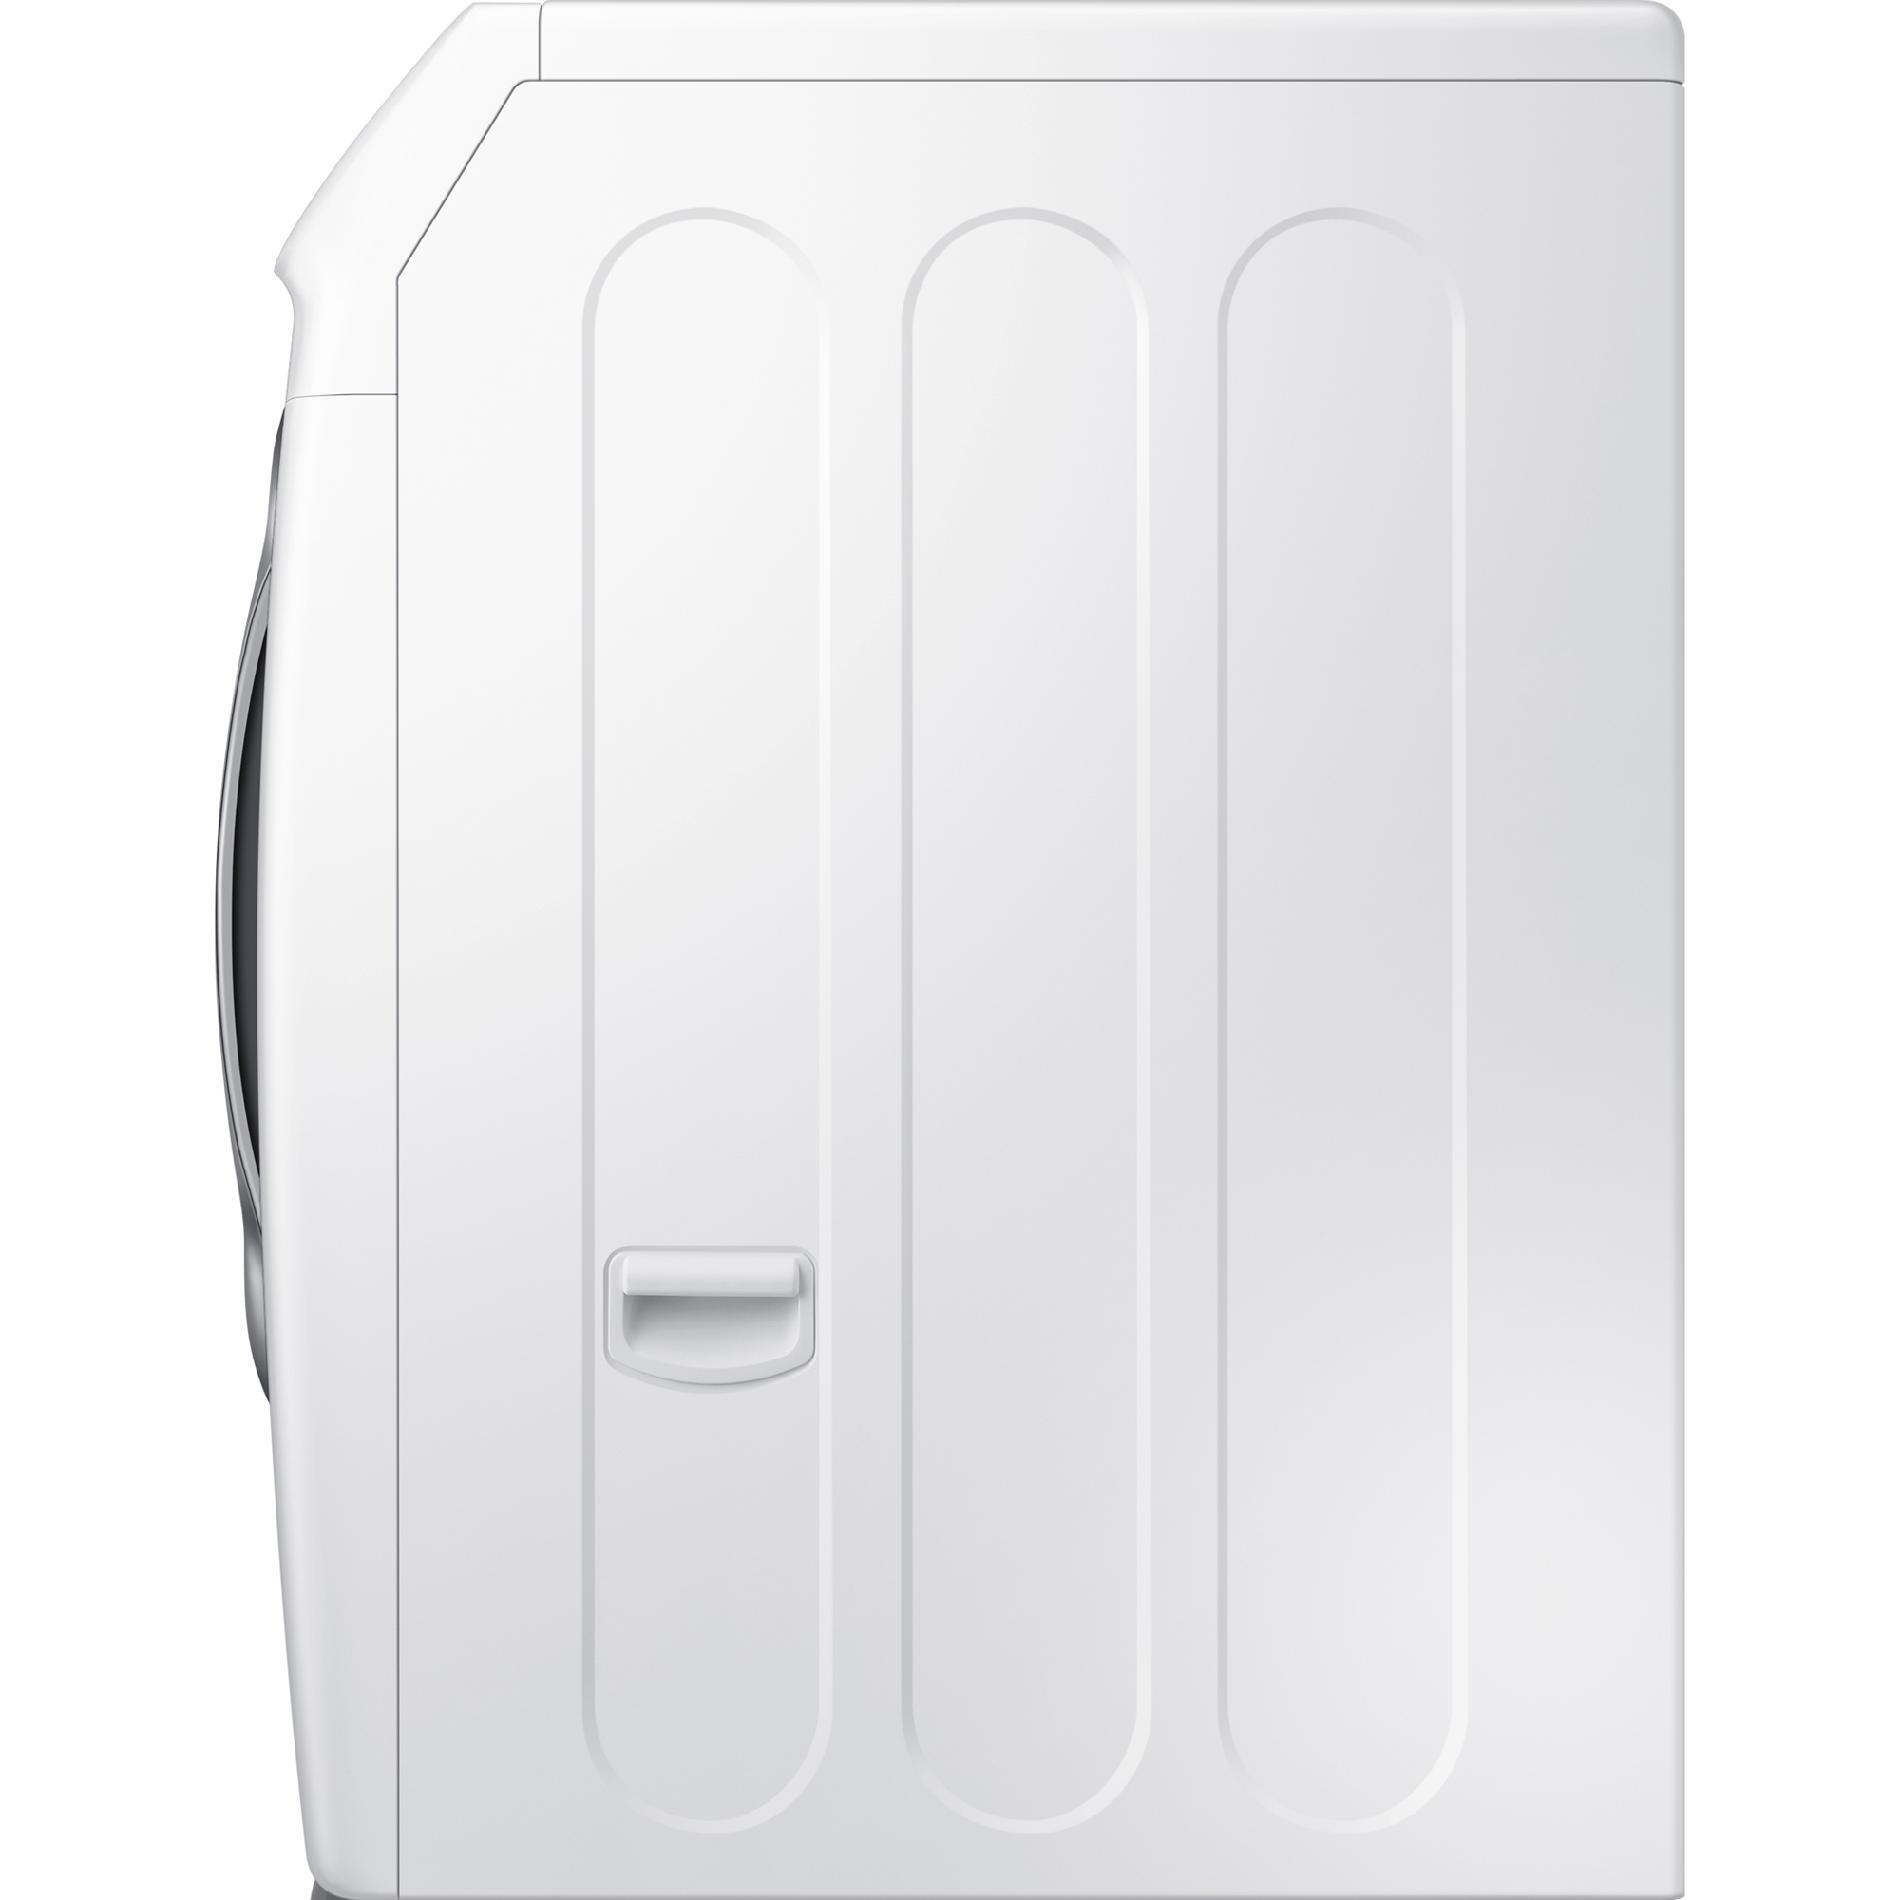 samsung wf42h5200aw washing machine